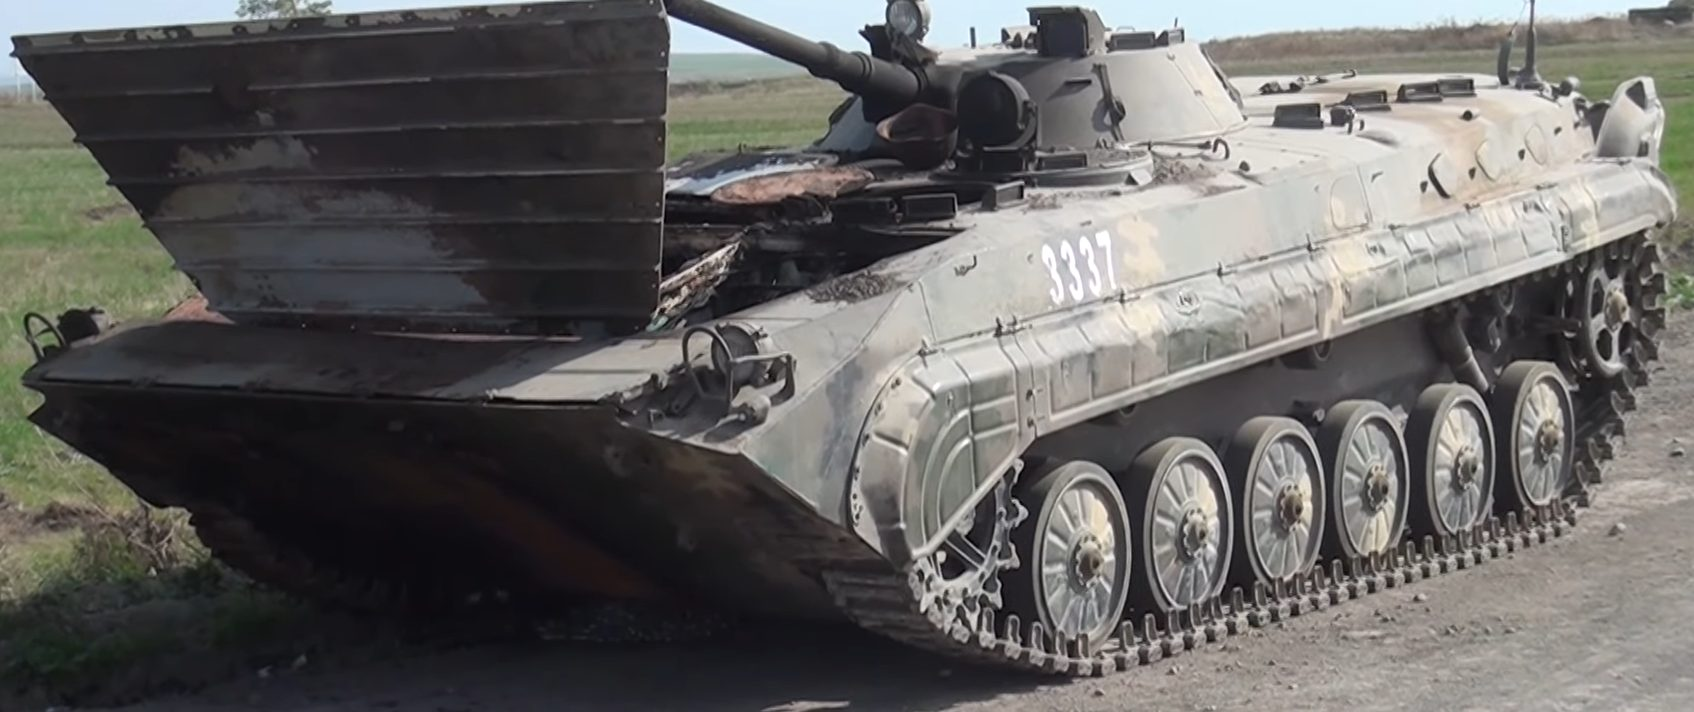 Armenia Proves Azerbaijan's Combat Aircraft Operated Out Of Turkey